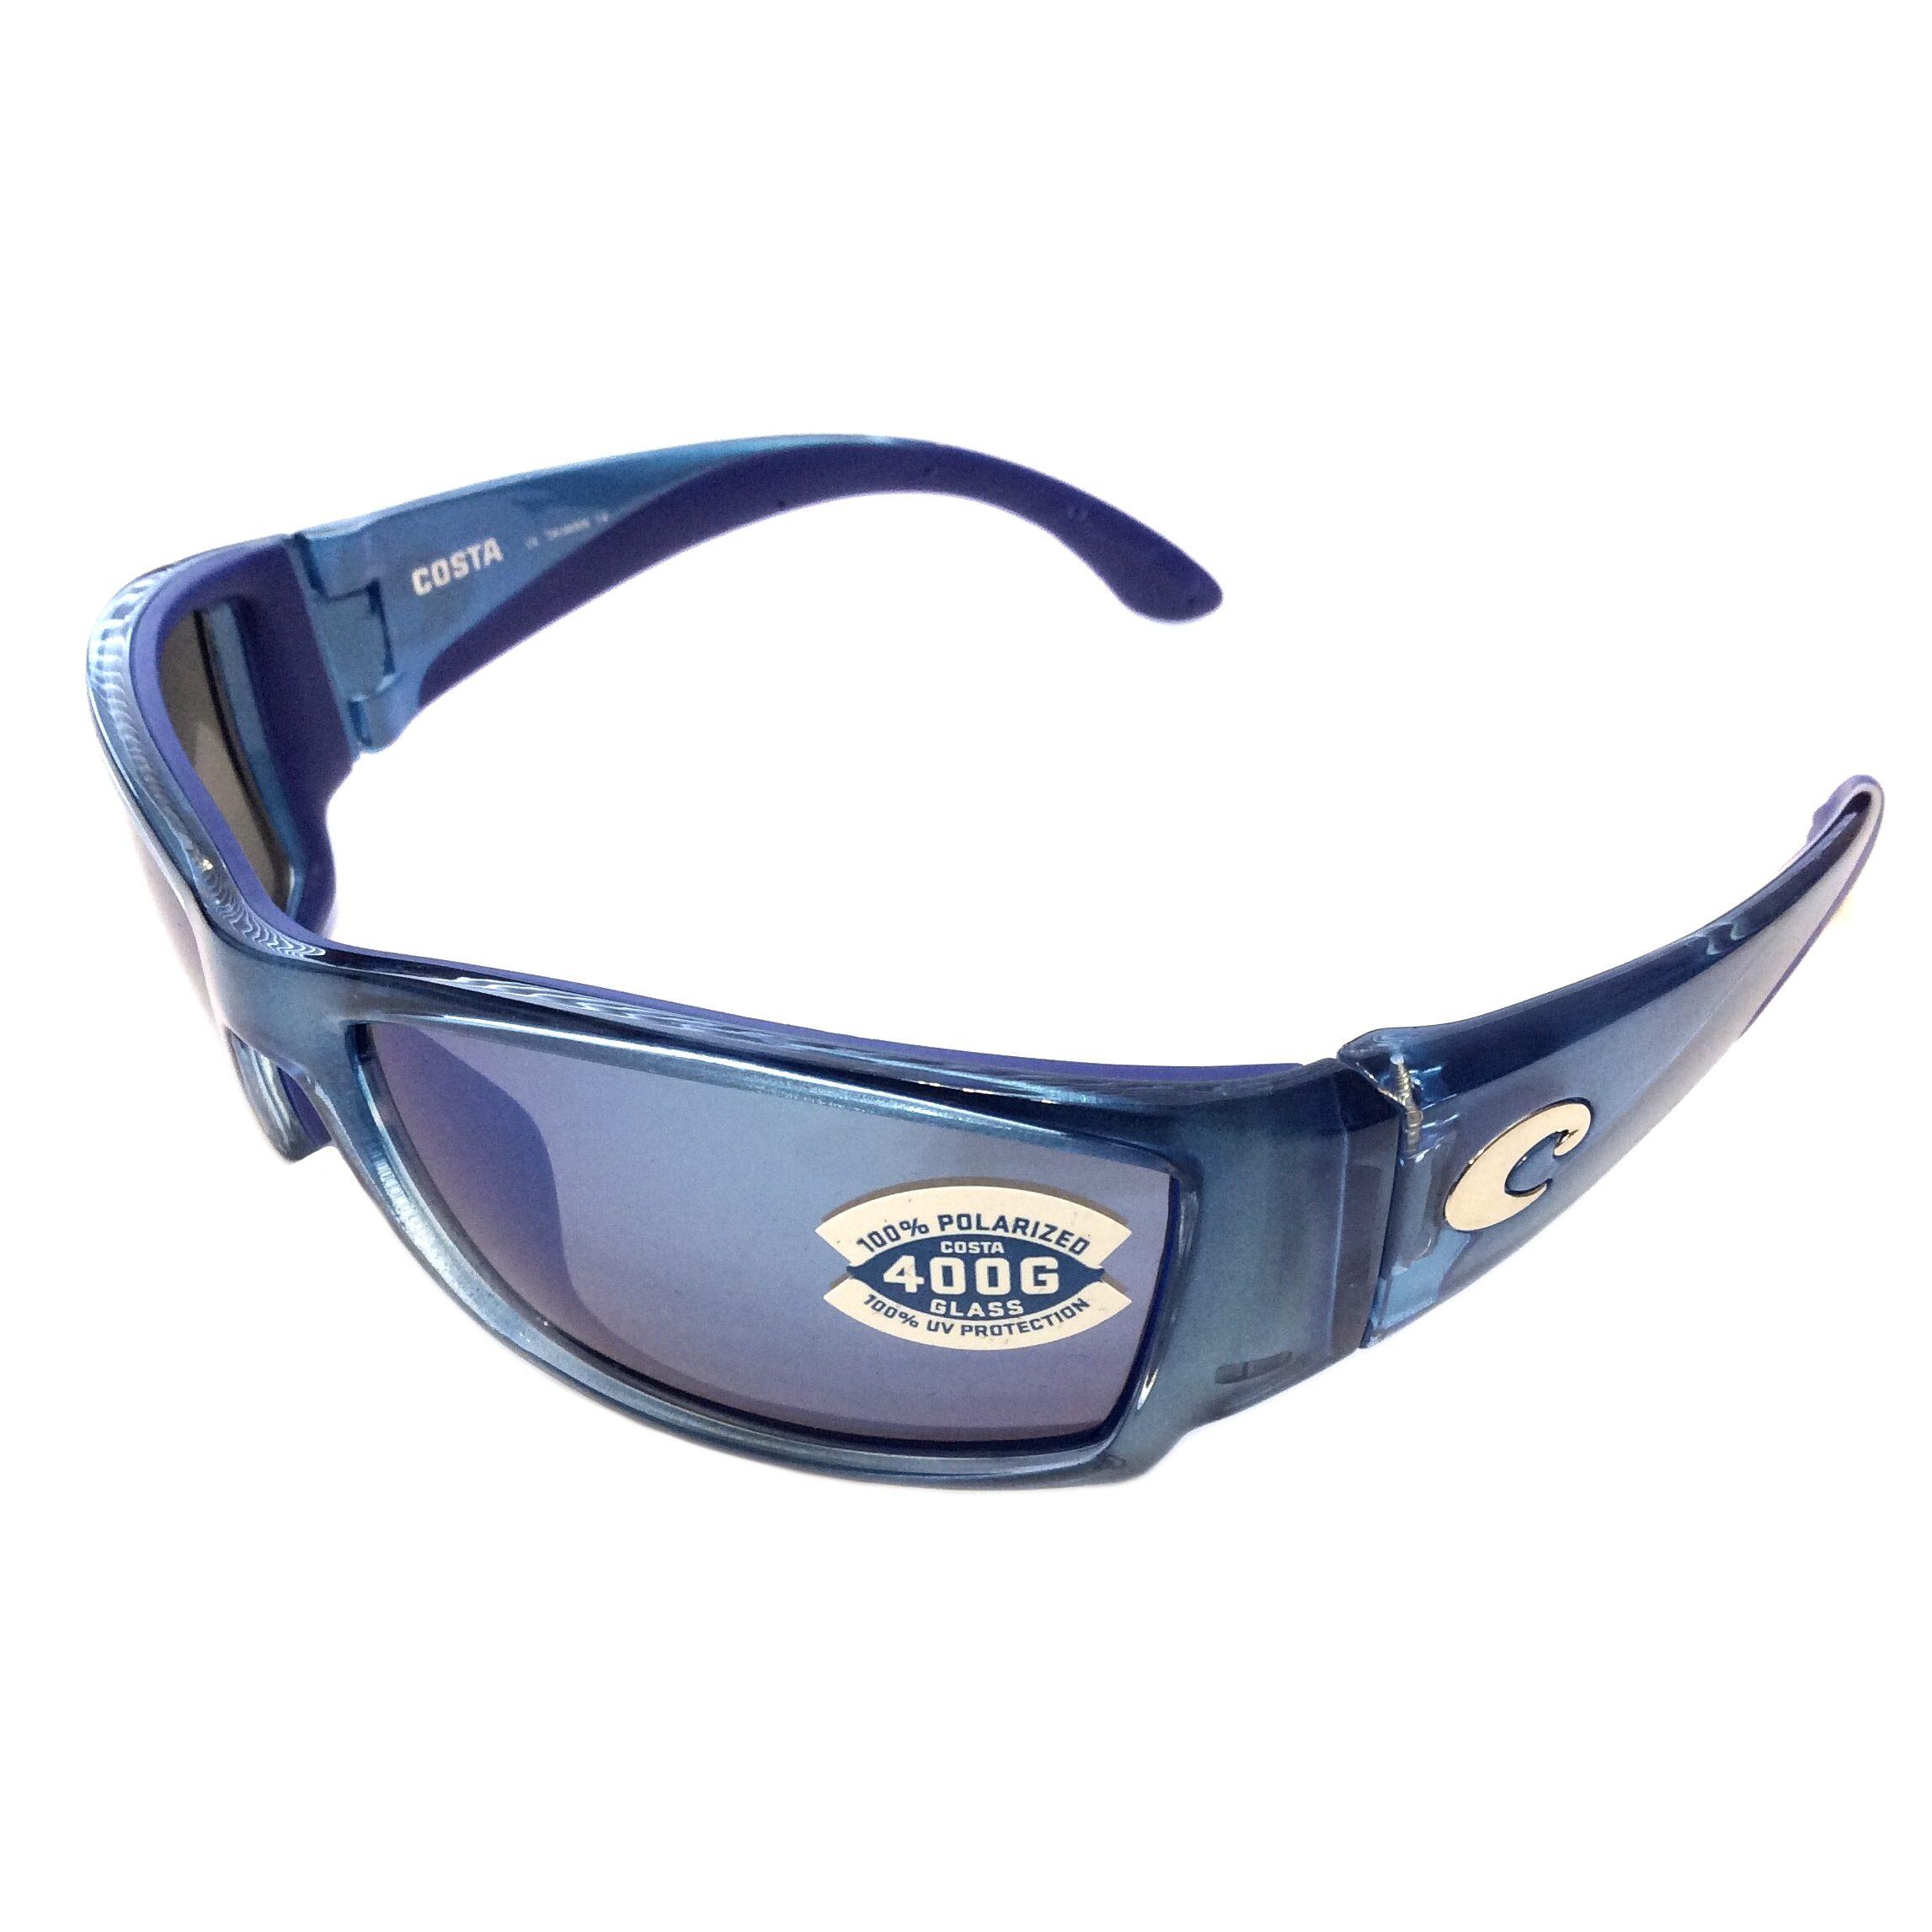 6ec8a44c6b Costa Corbina Sunglasses – Sky Blue Polarized Mirror 400G ...